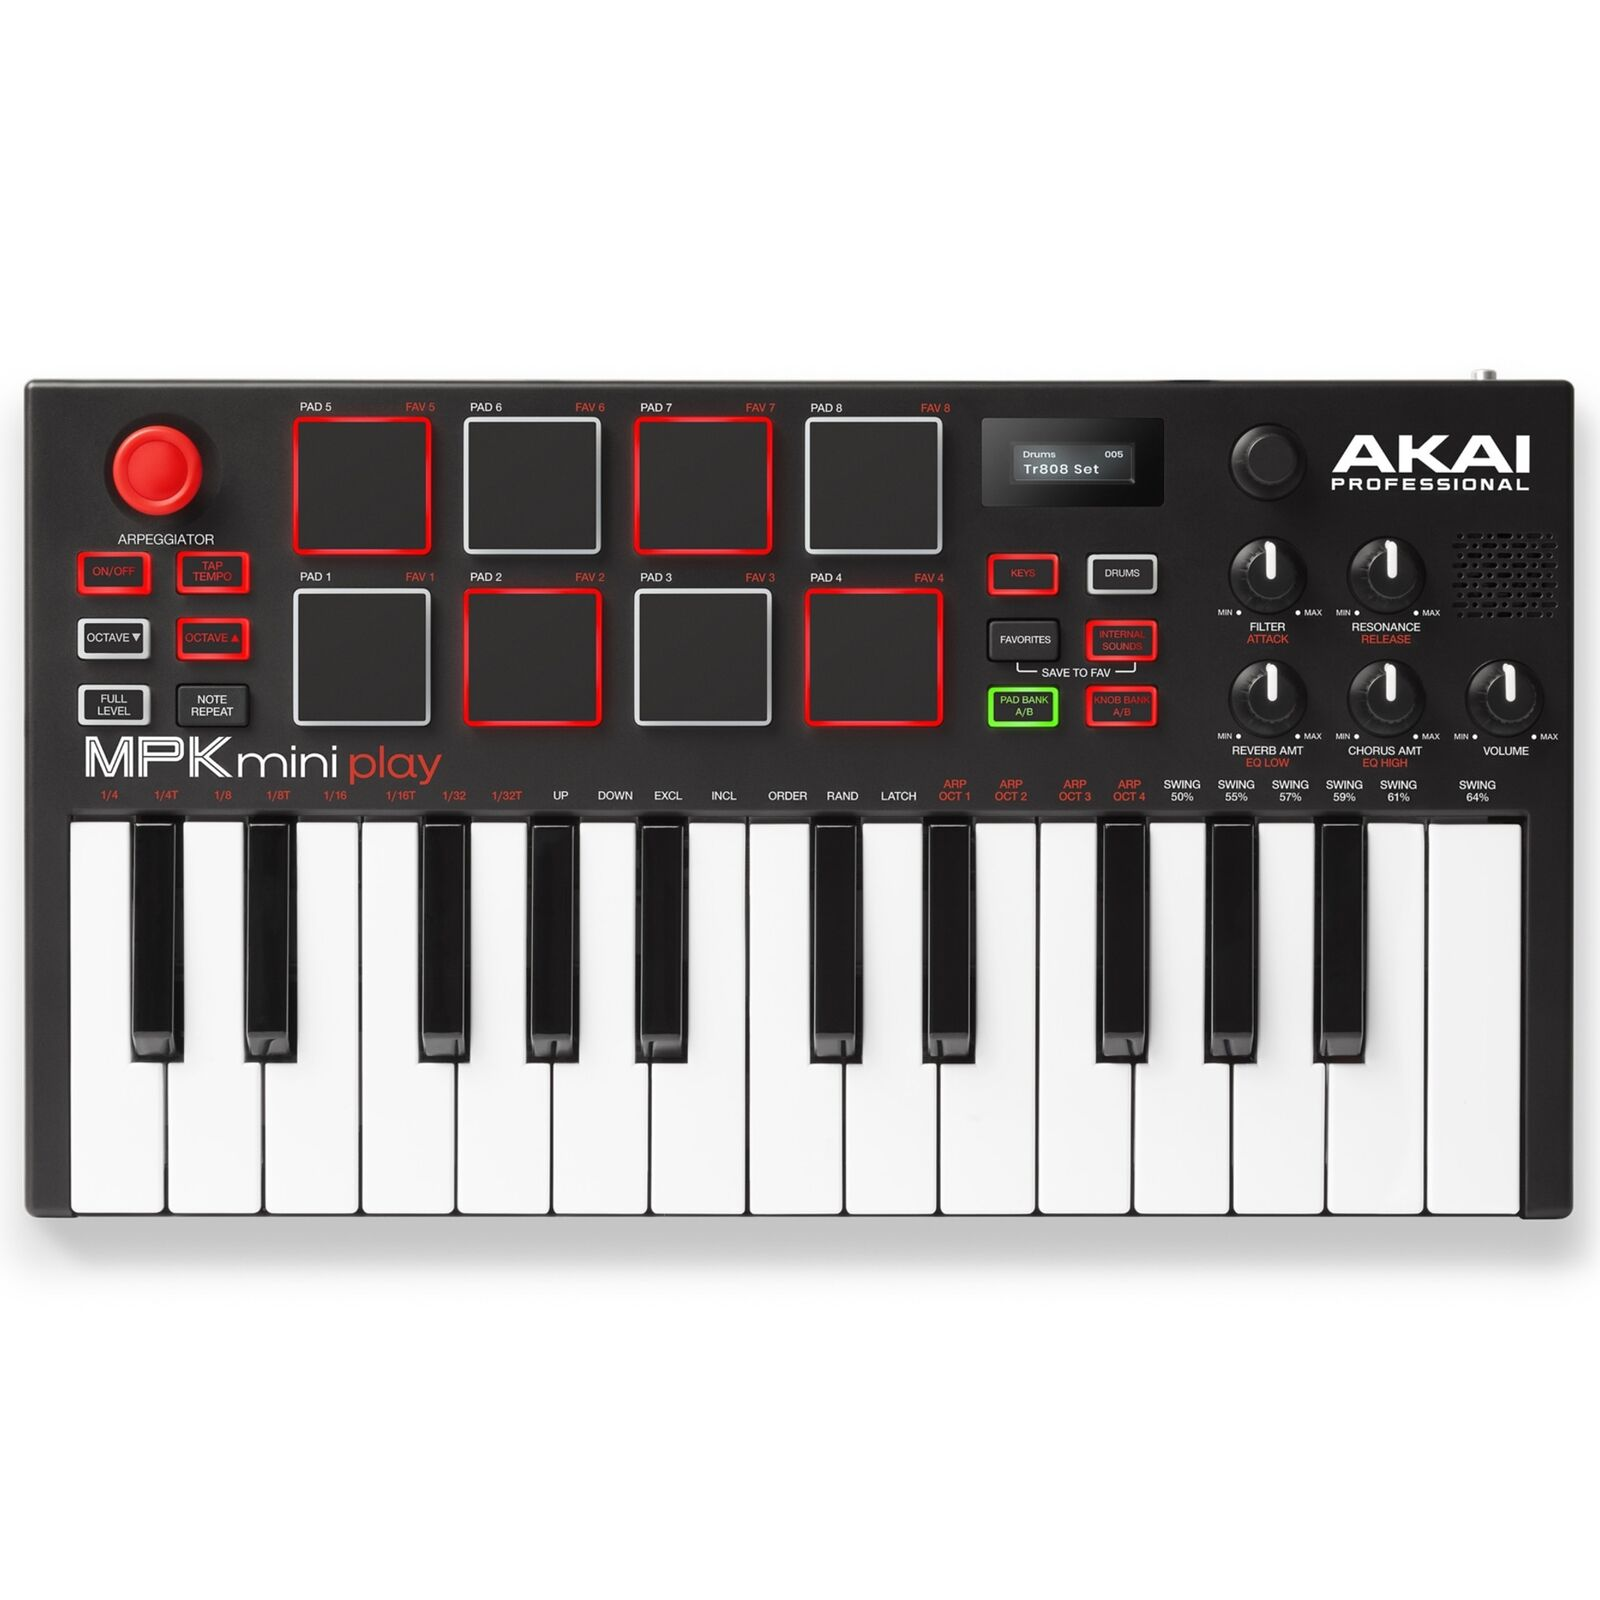 Akai MPK Mini Play Mini Keyboard with Built-in Speakers & USB Pad Controller